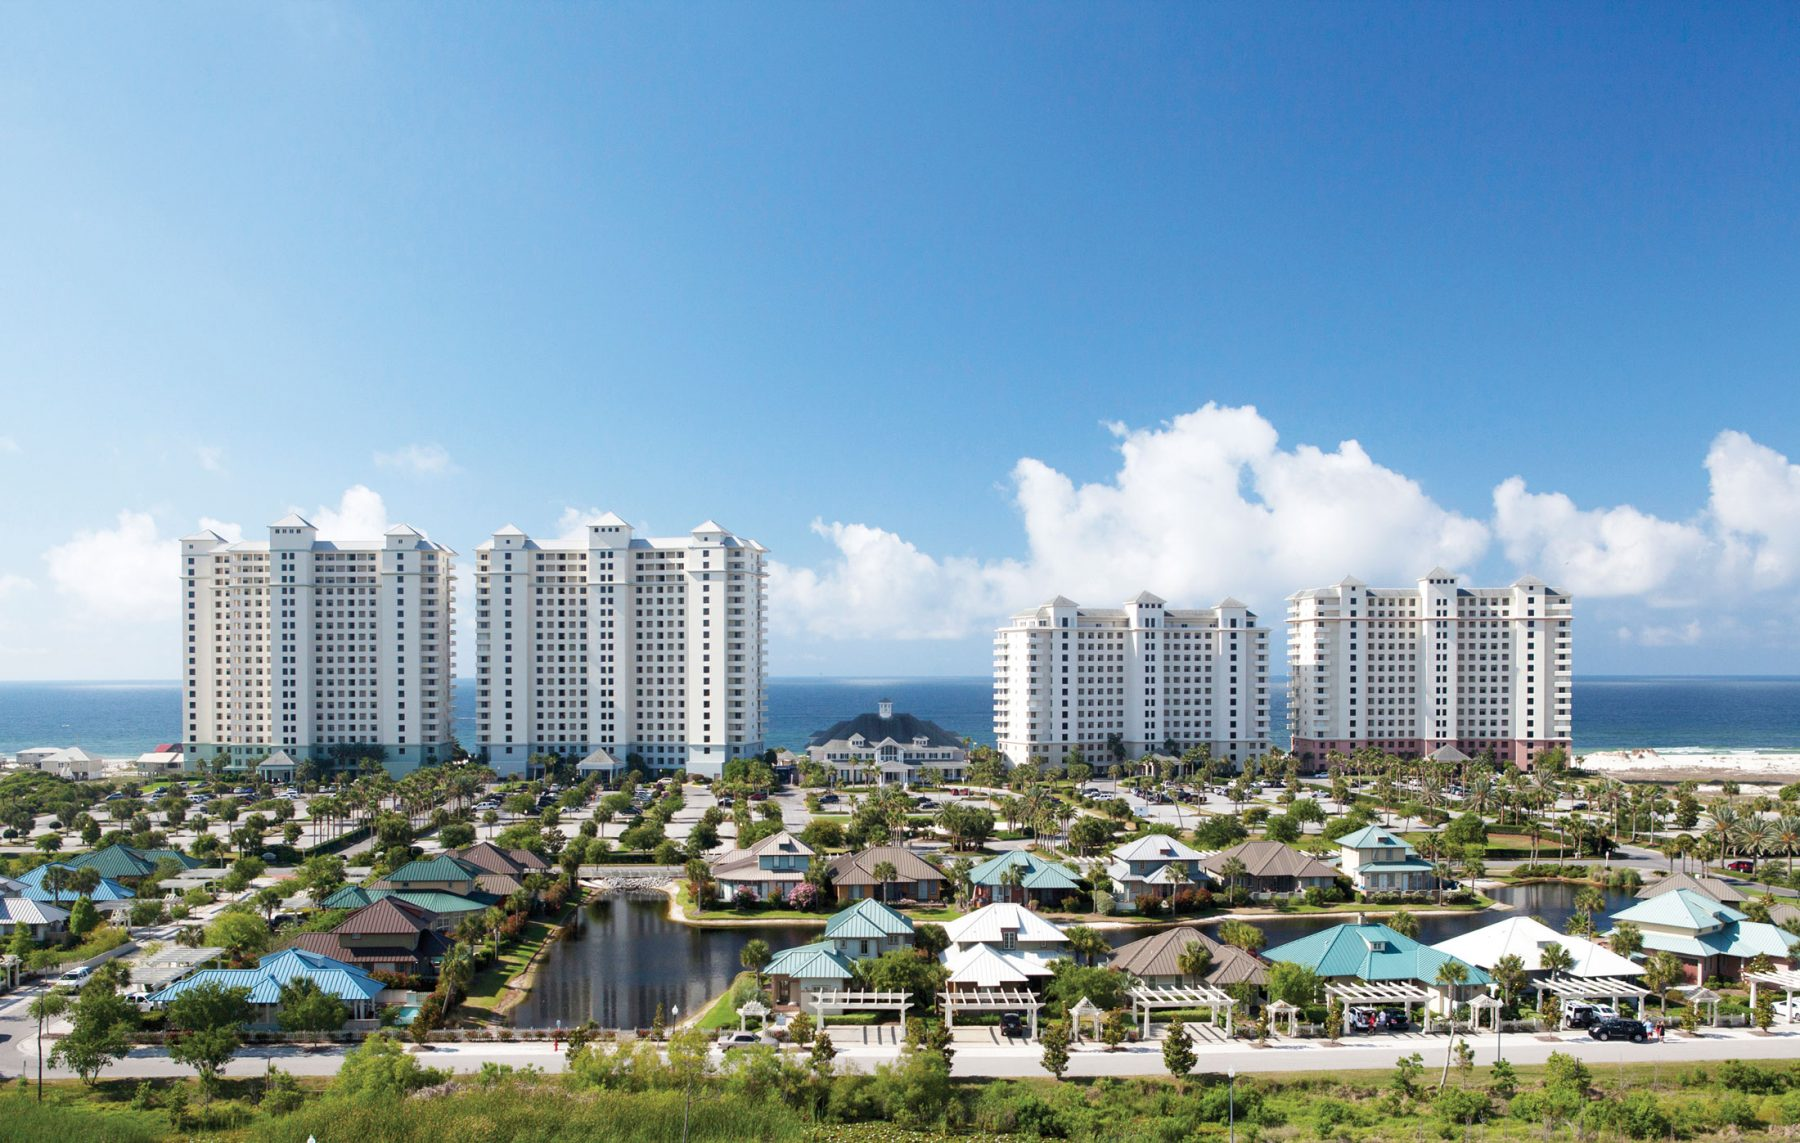 Hotels Gulf Ss On The Beach Newatvs Info